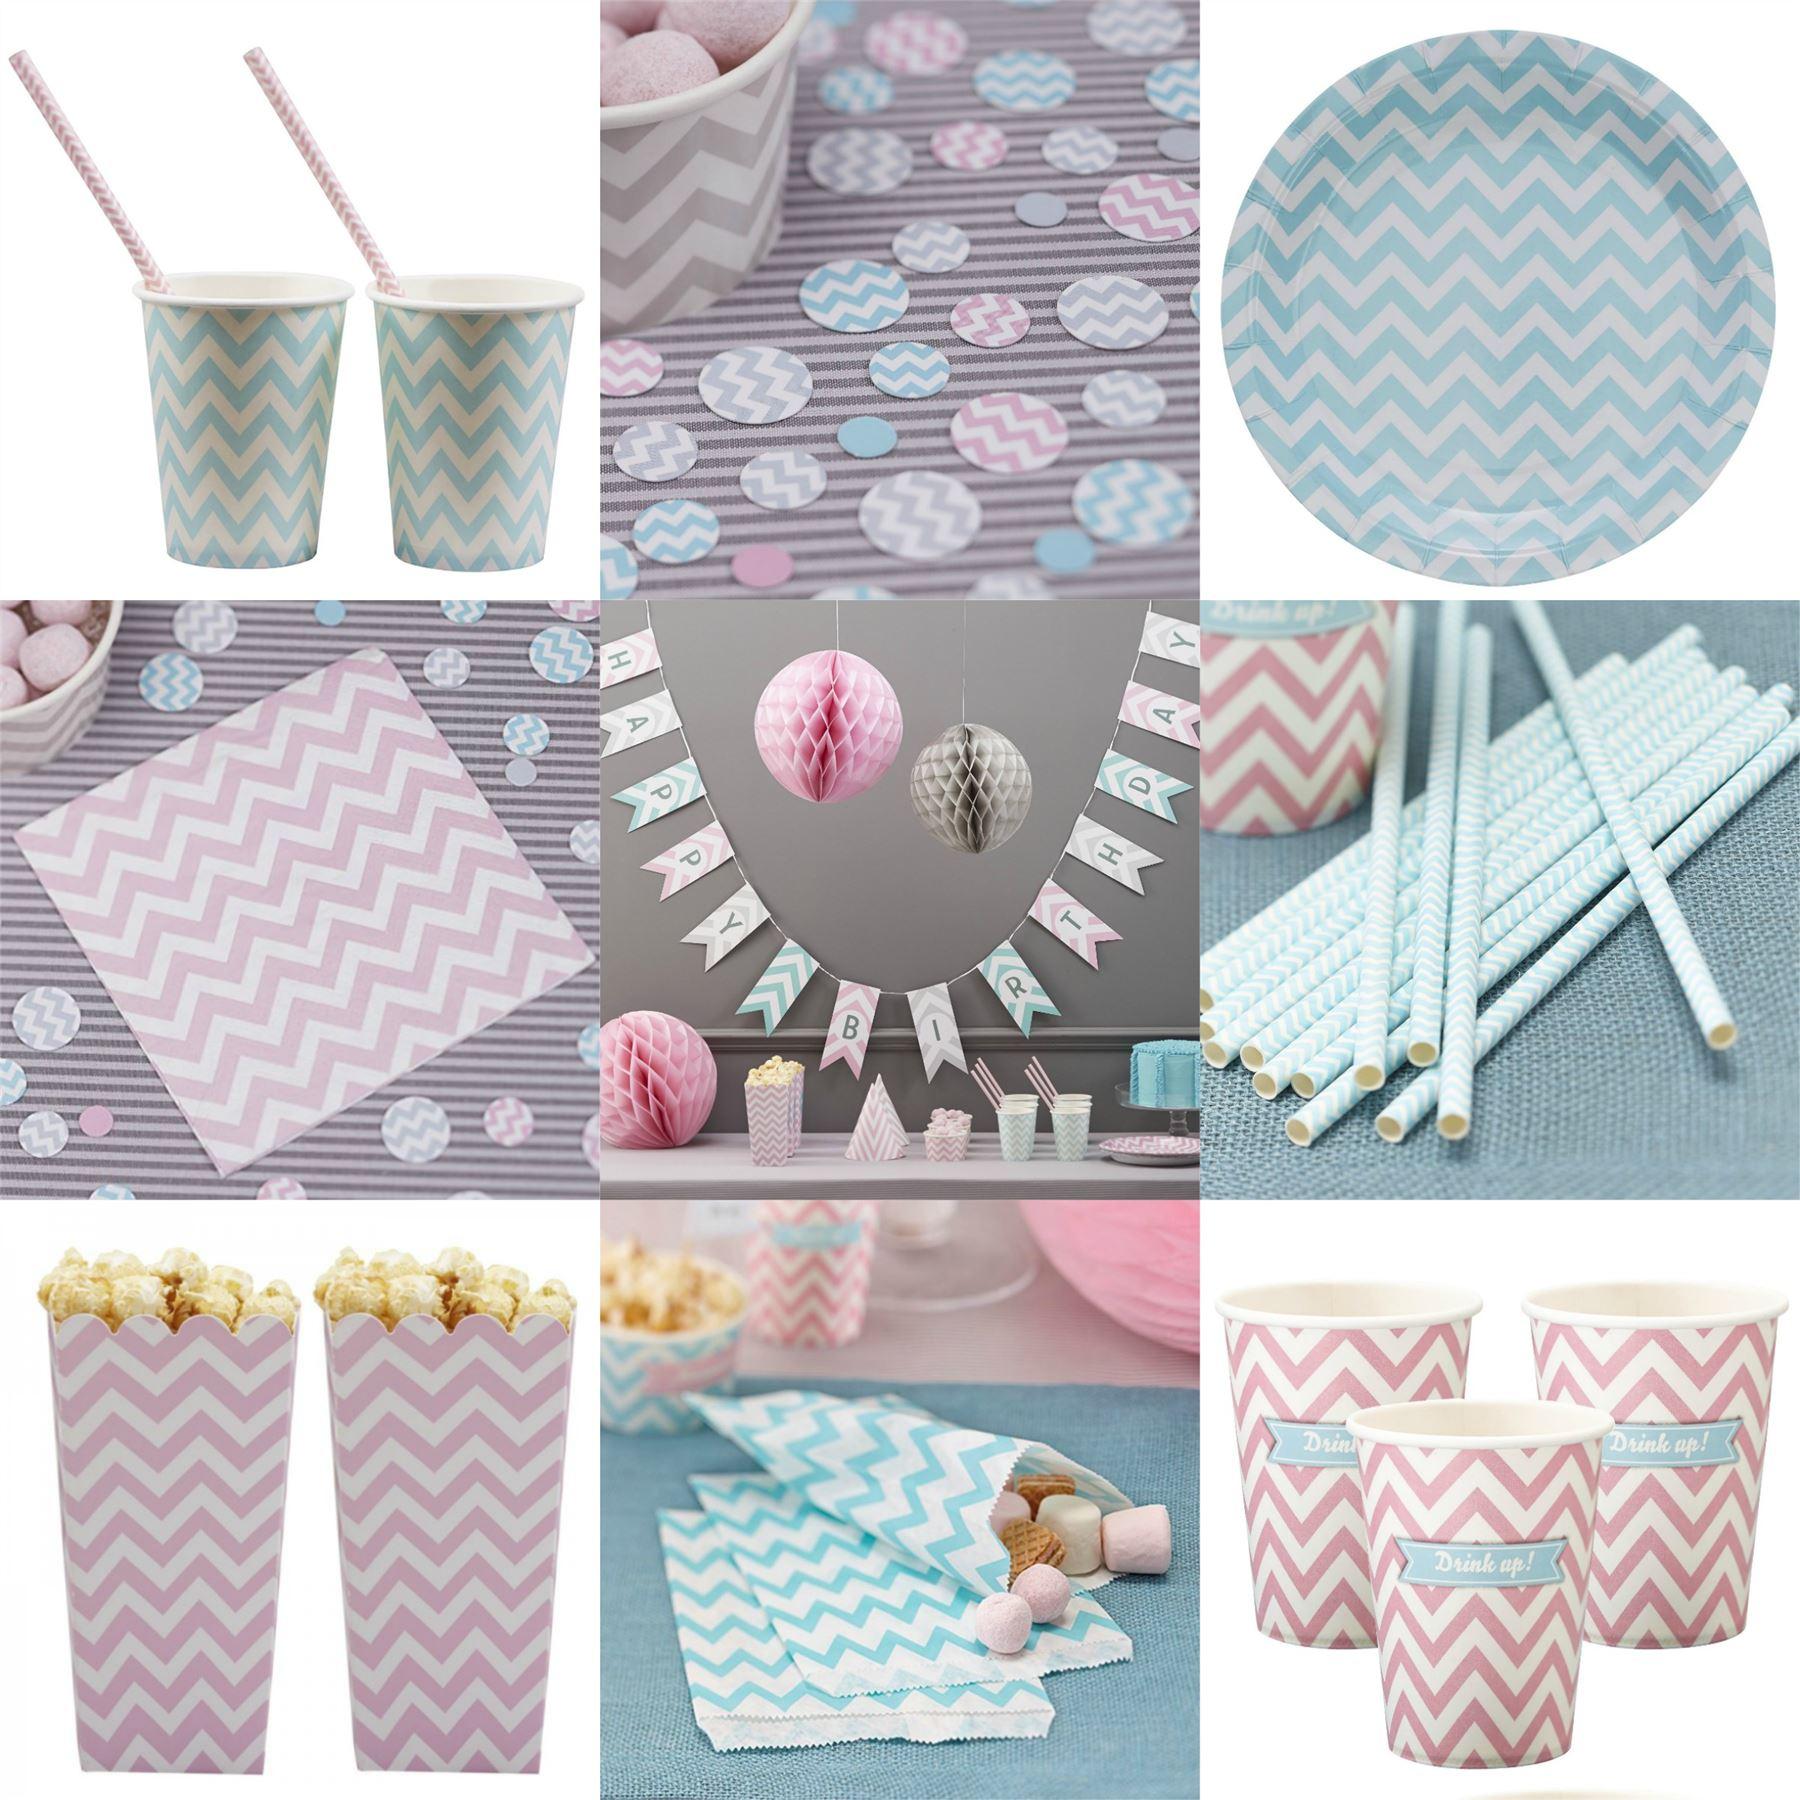 chevron divine print party tableware baby shower neutral decorations